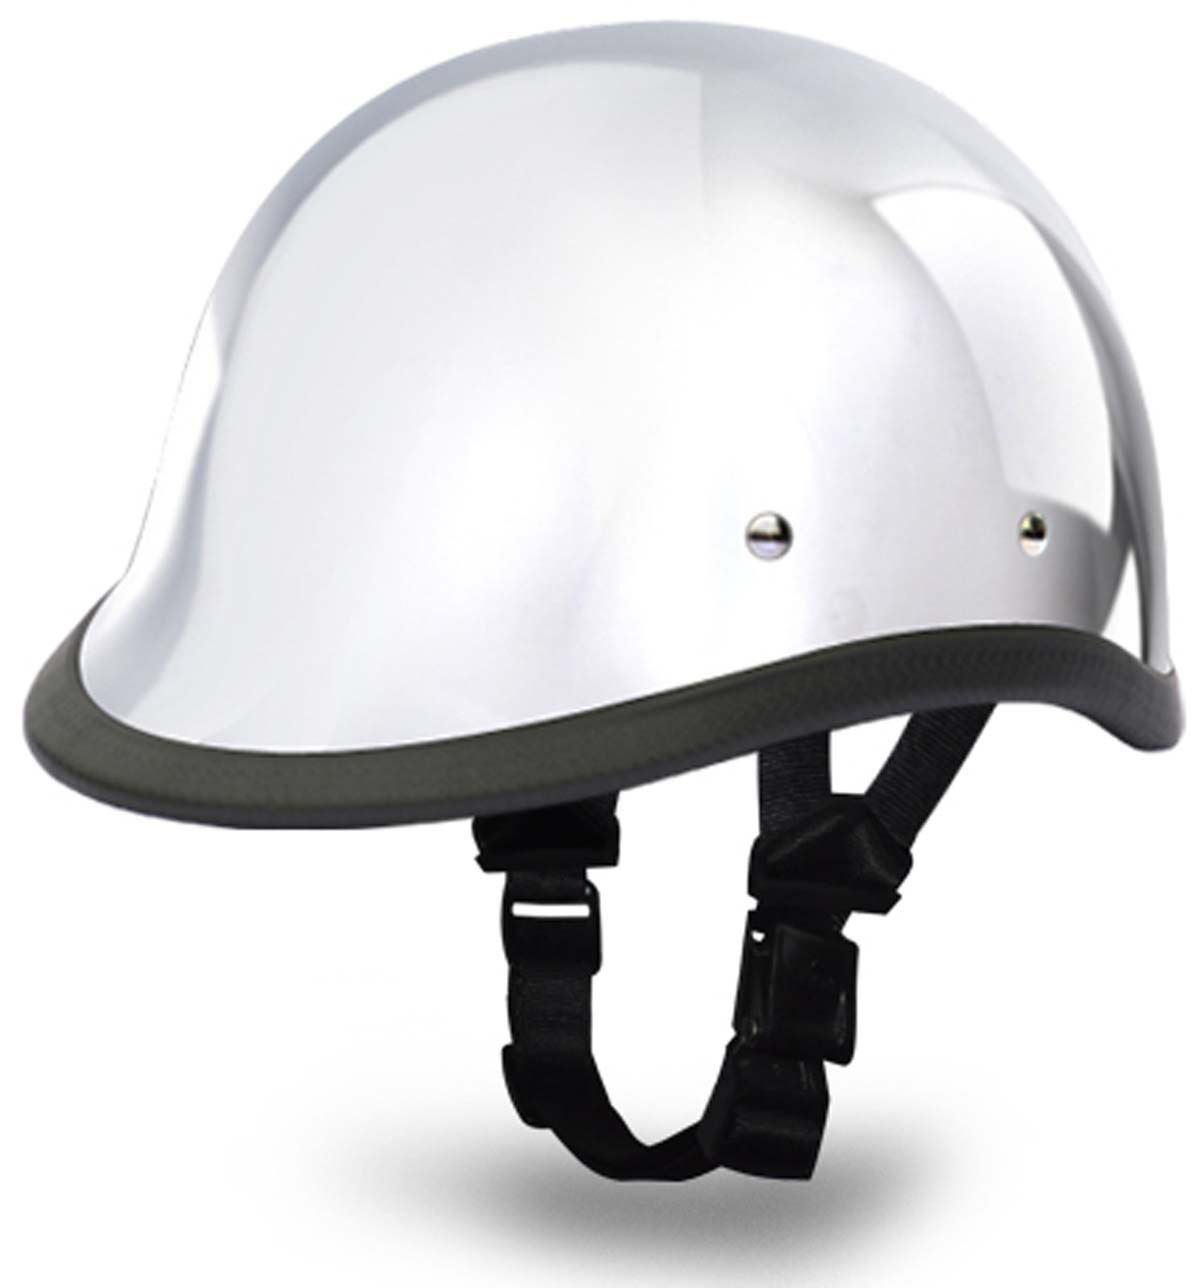 Daytona Hawk Novelty Helmet Polo - 53.7KB